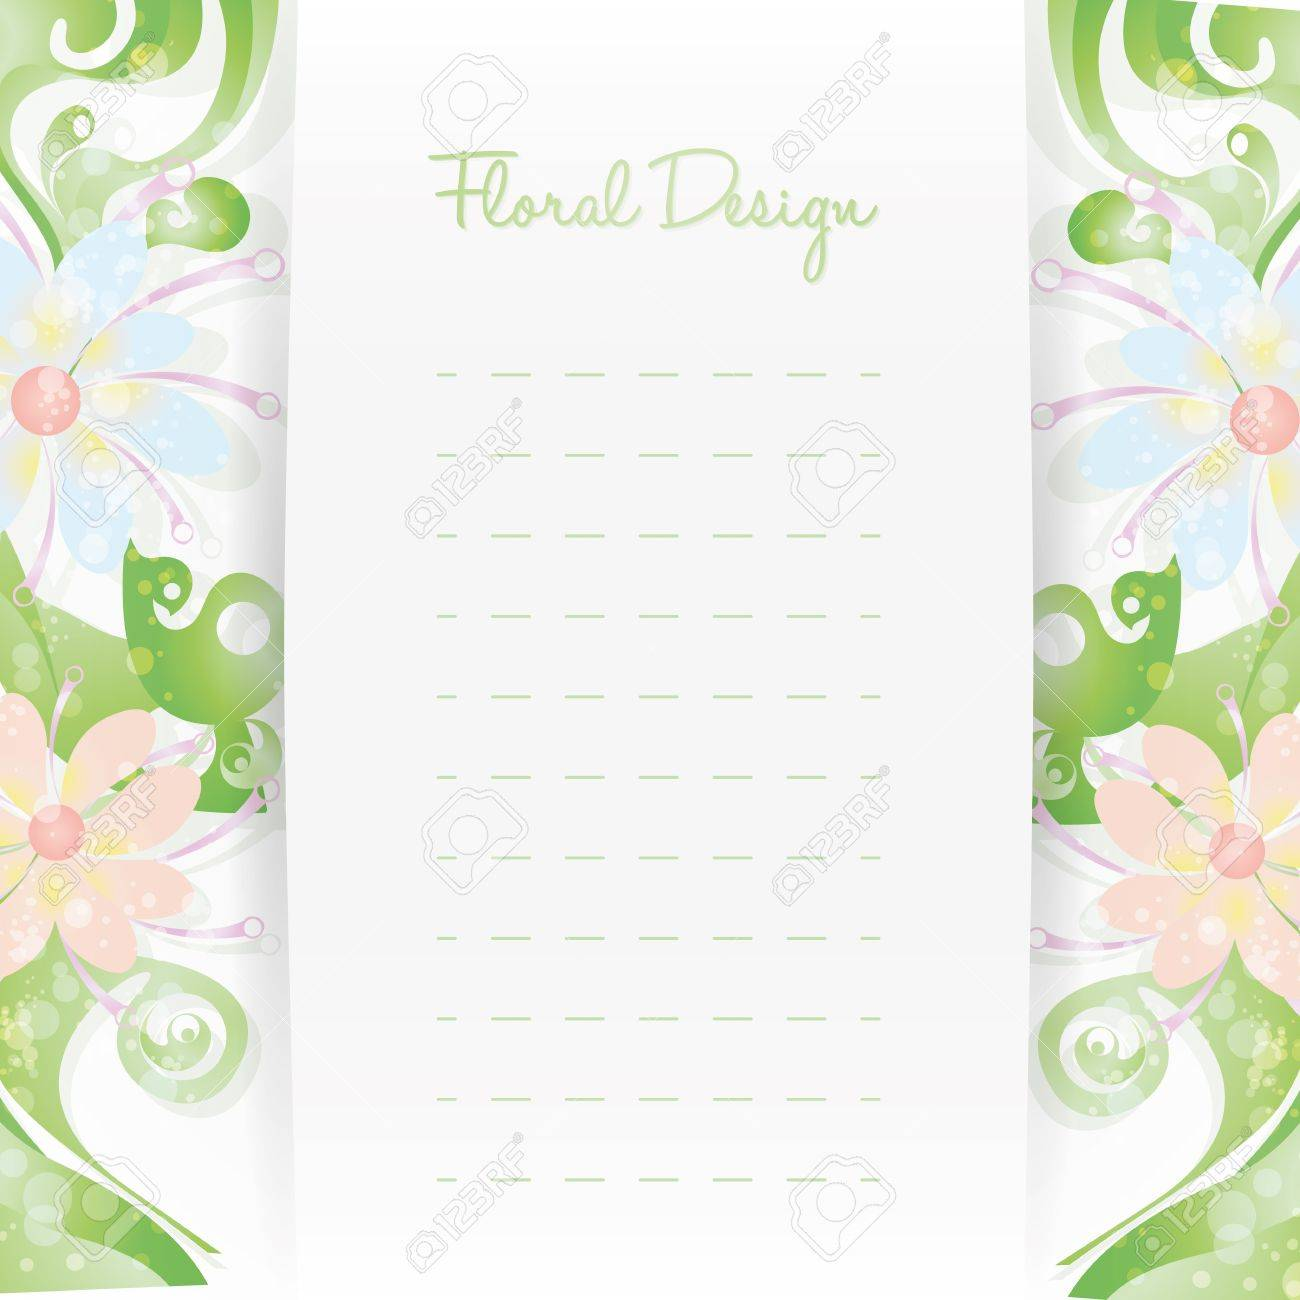 Floral Card Invitation Template Flower Design Royalty Free – Card Invitation Template